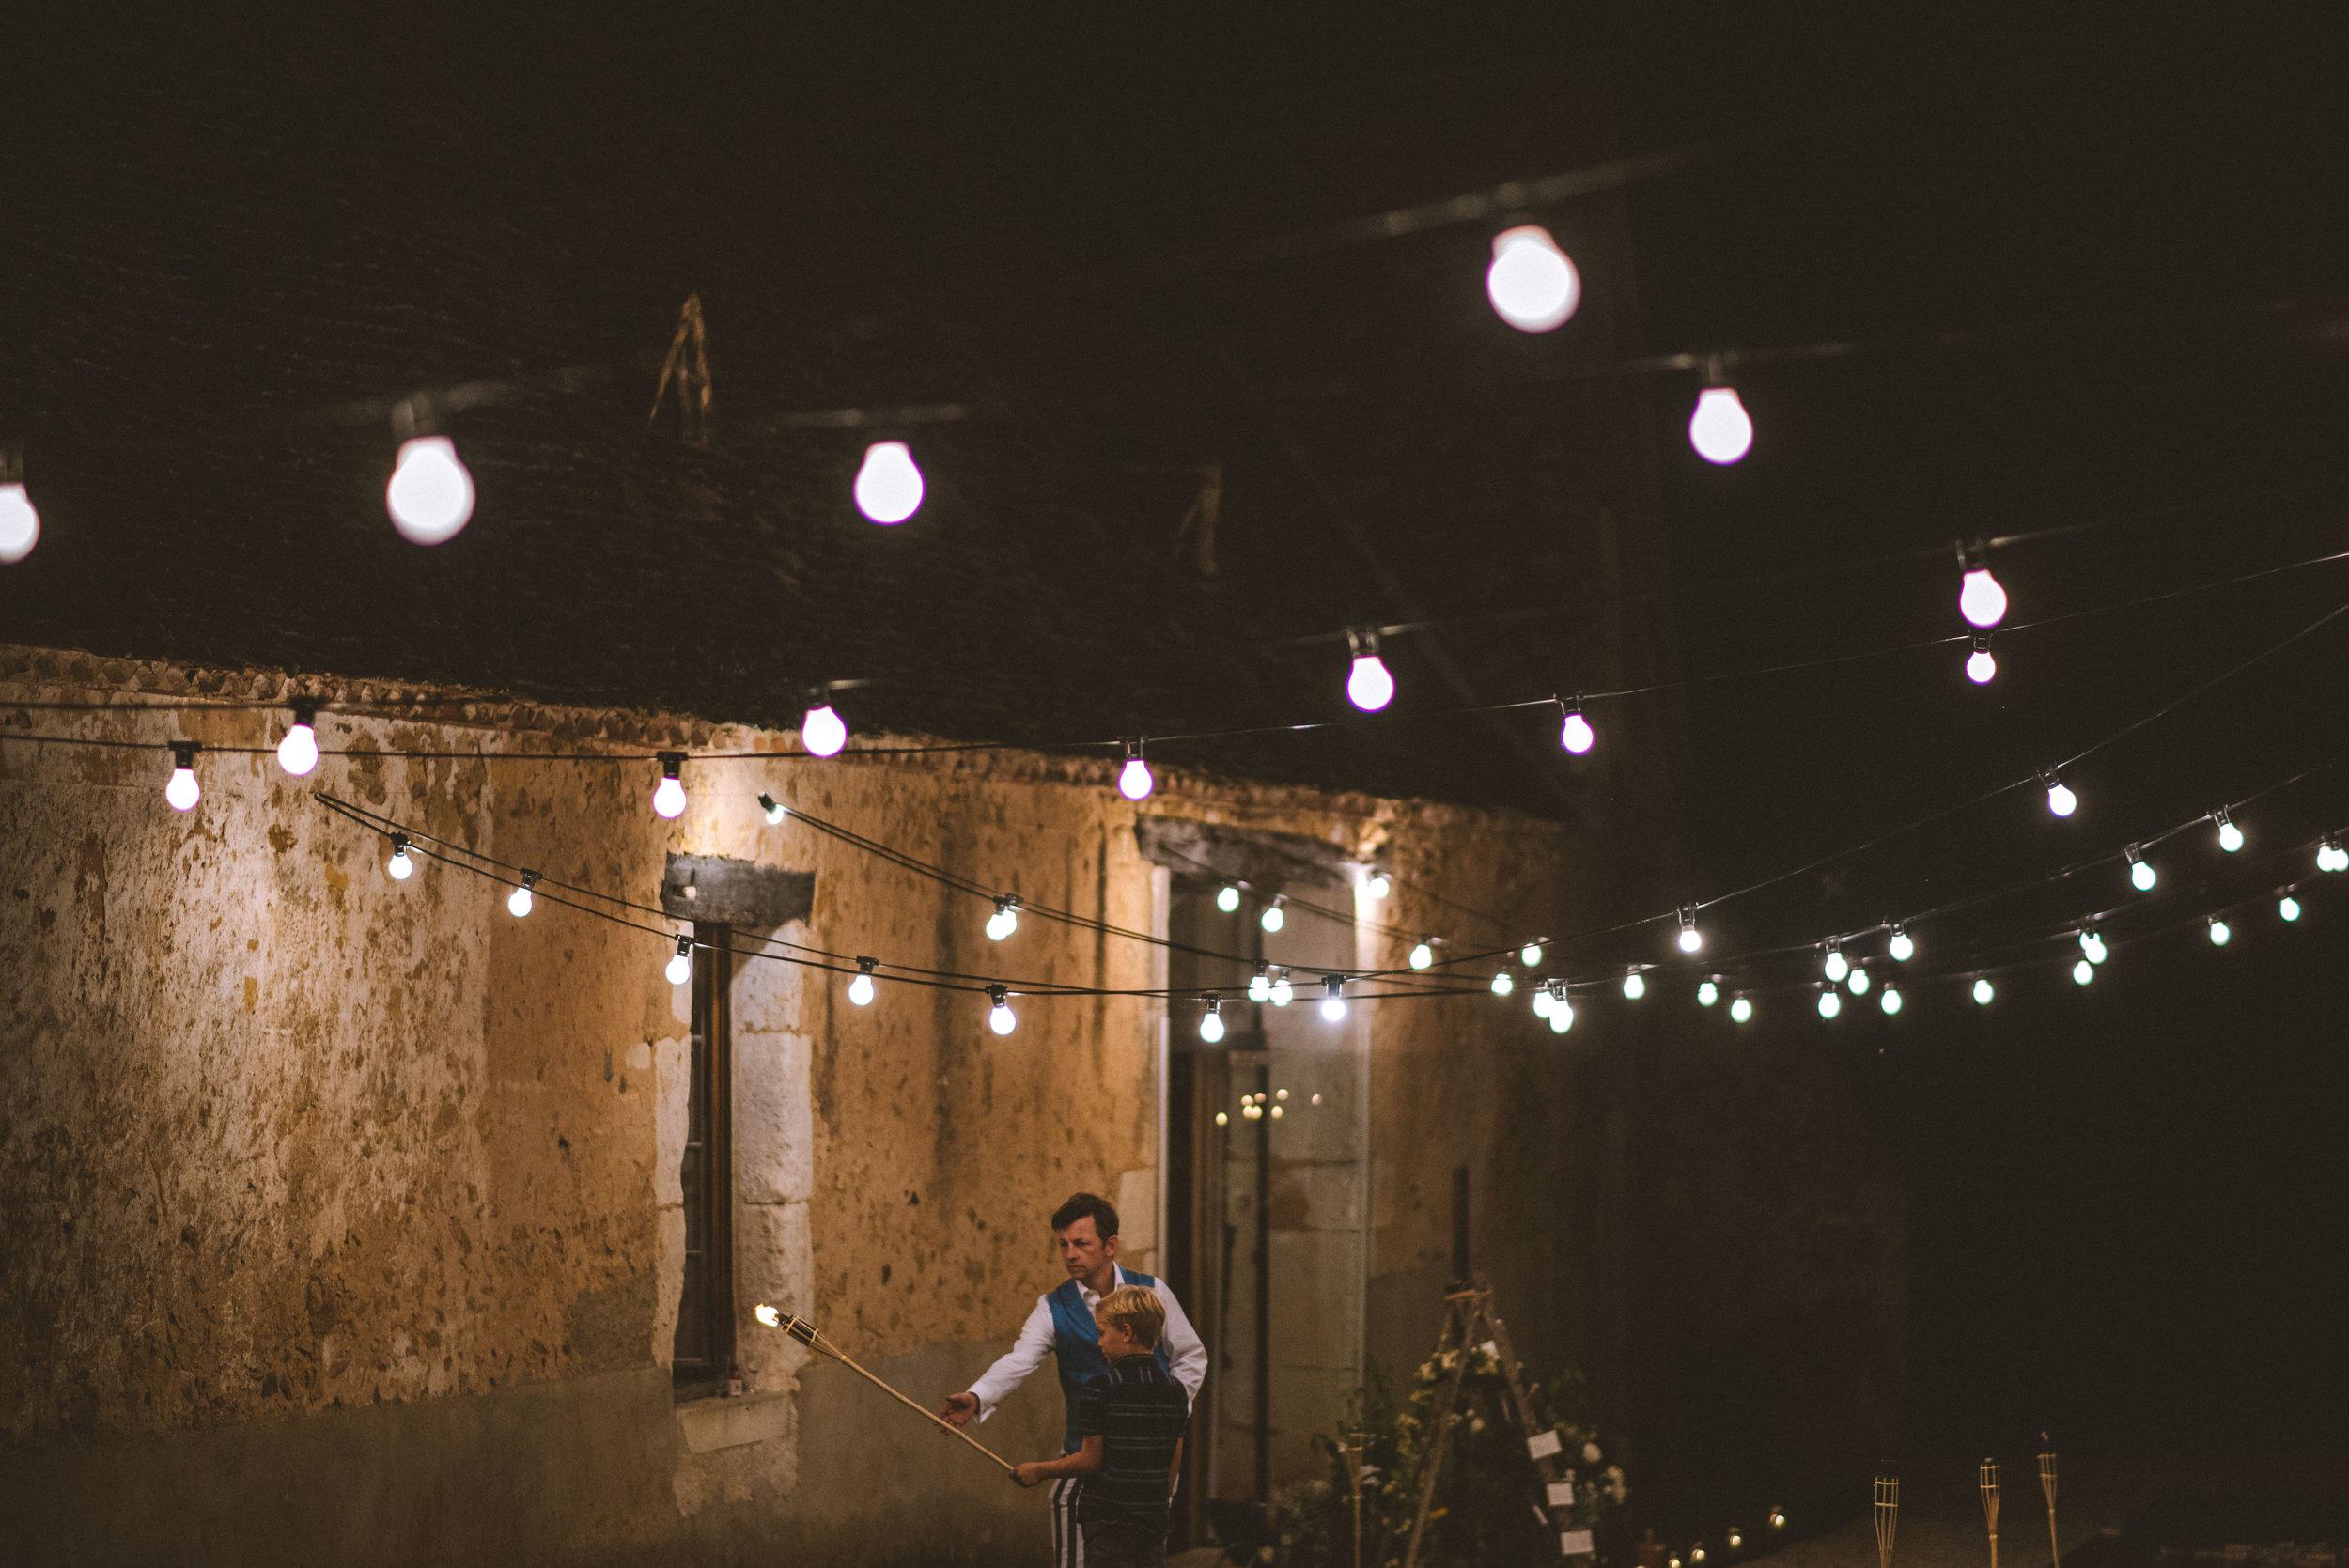 wedding-photographer-dordogne-mark-shaw-83.jpg